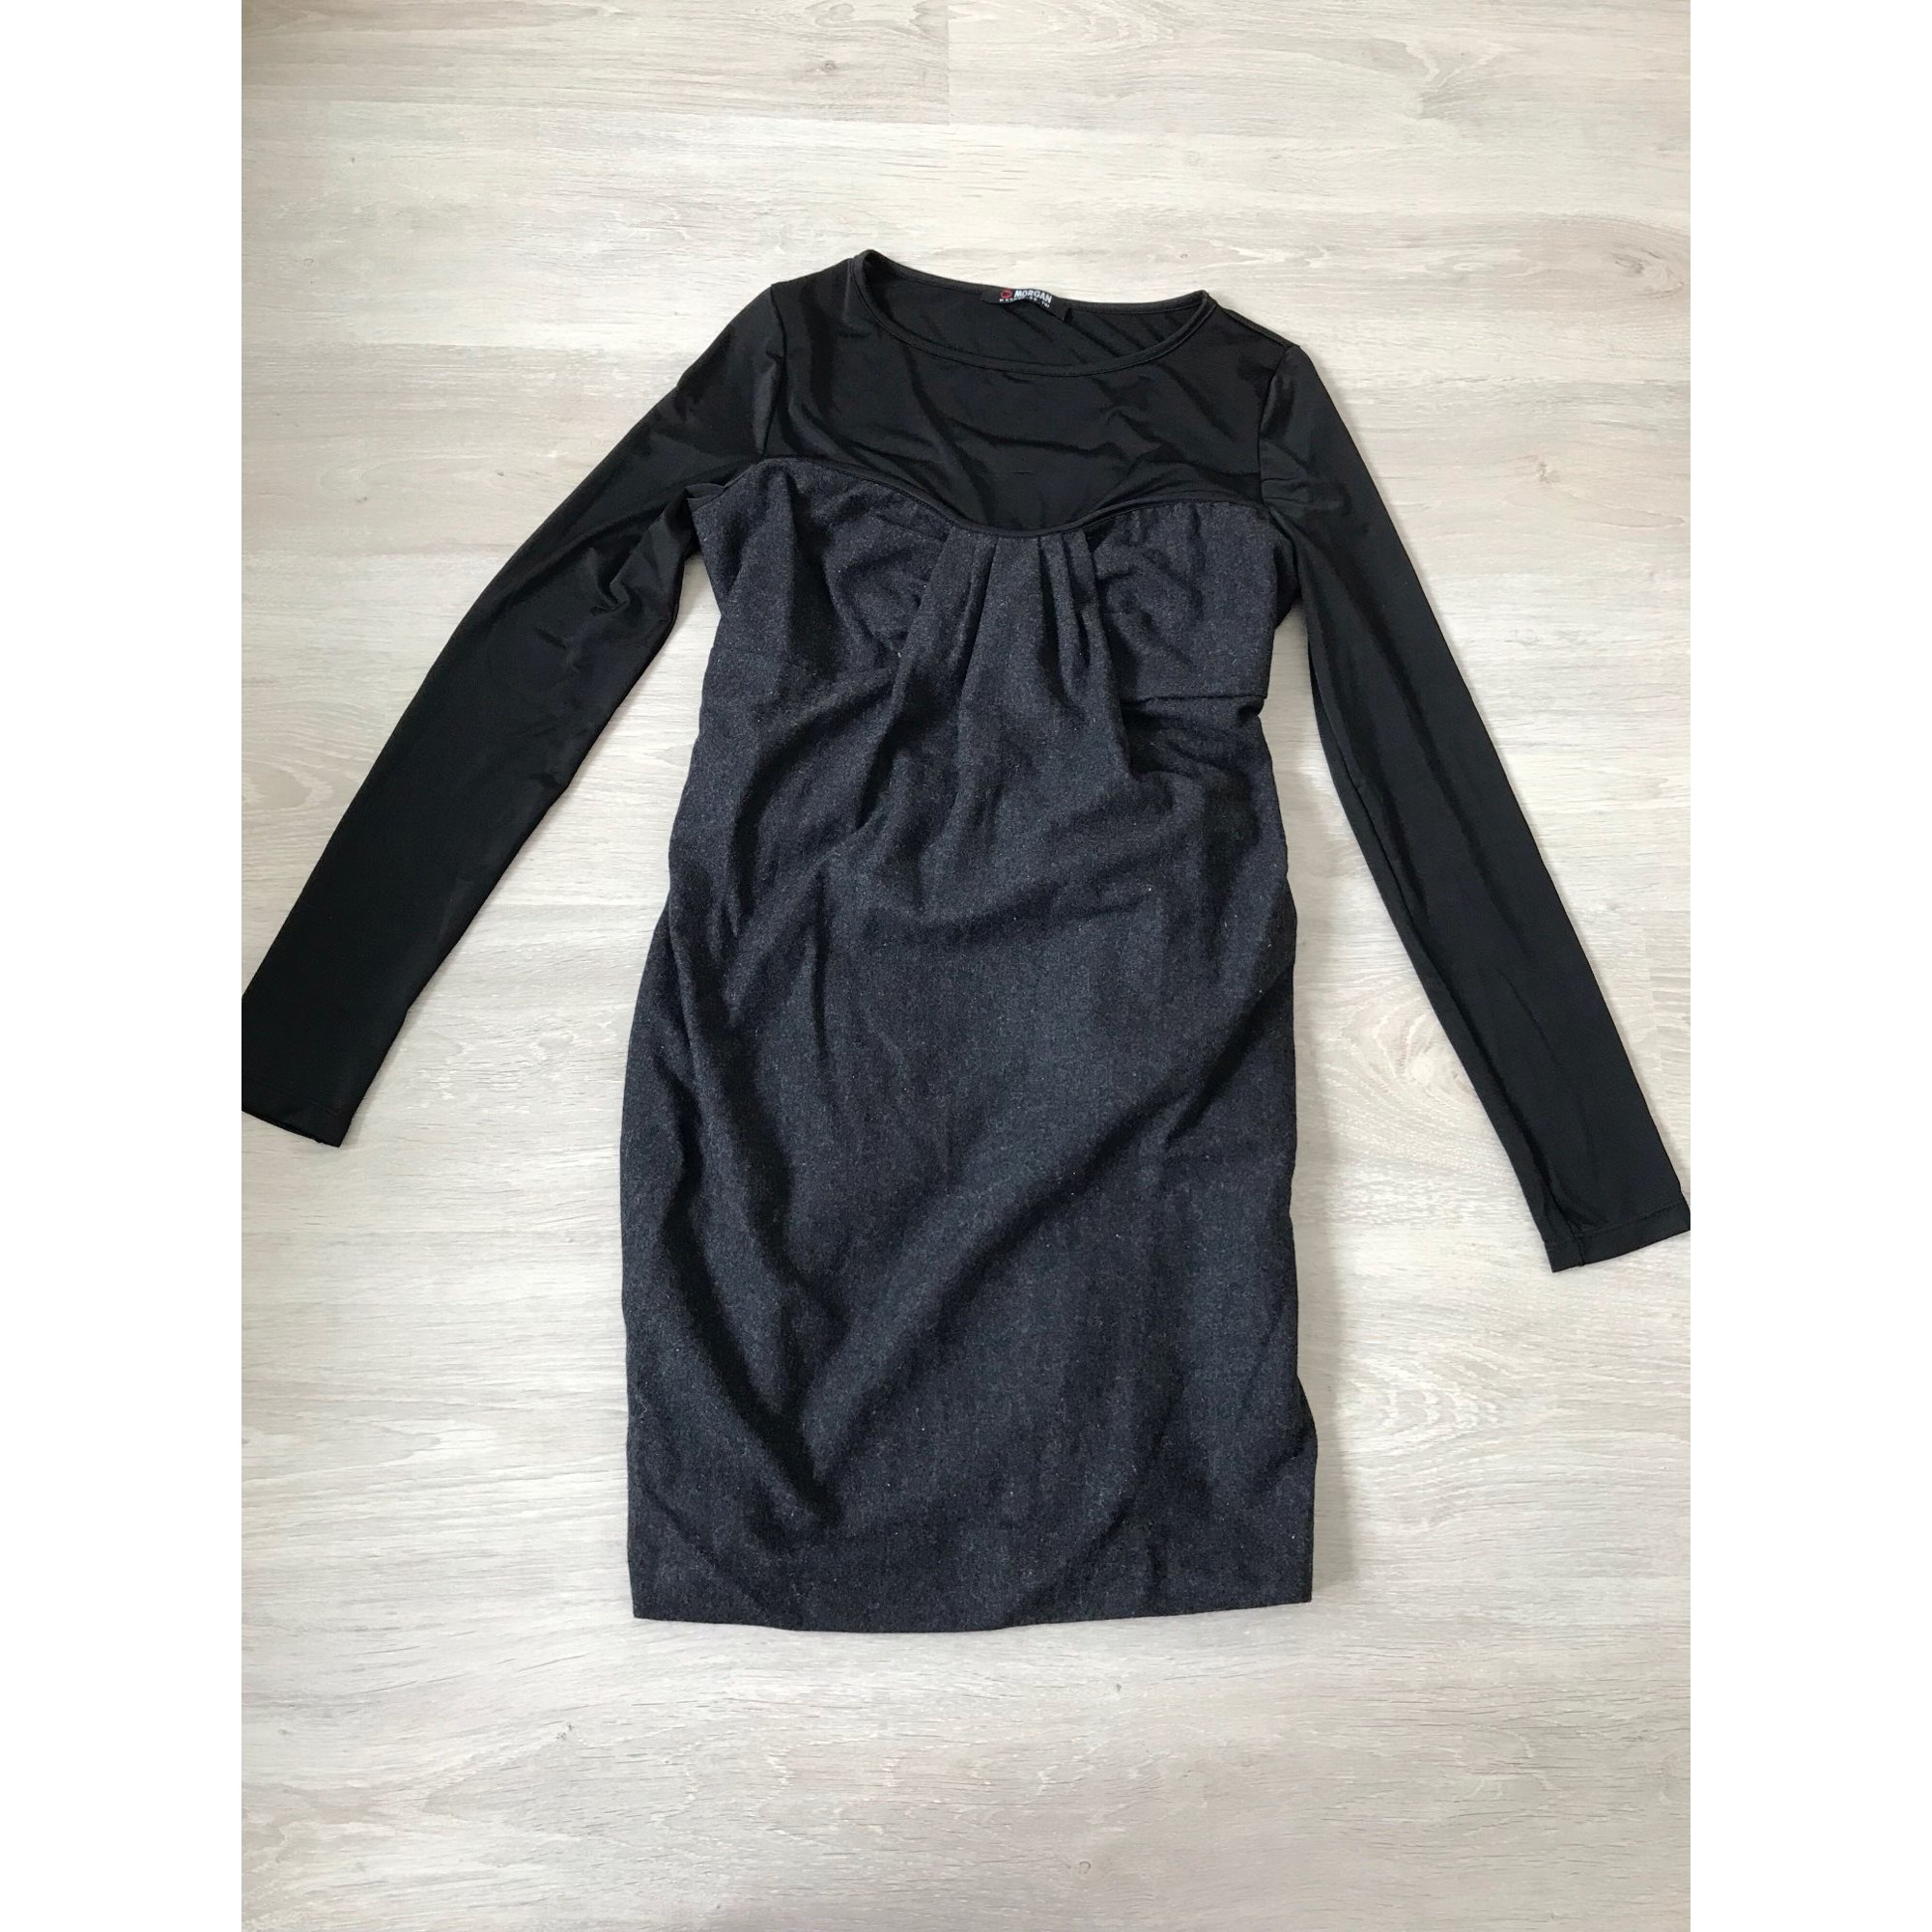 Robe courte MORGAN Gris, anthracite